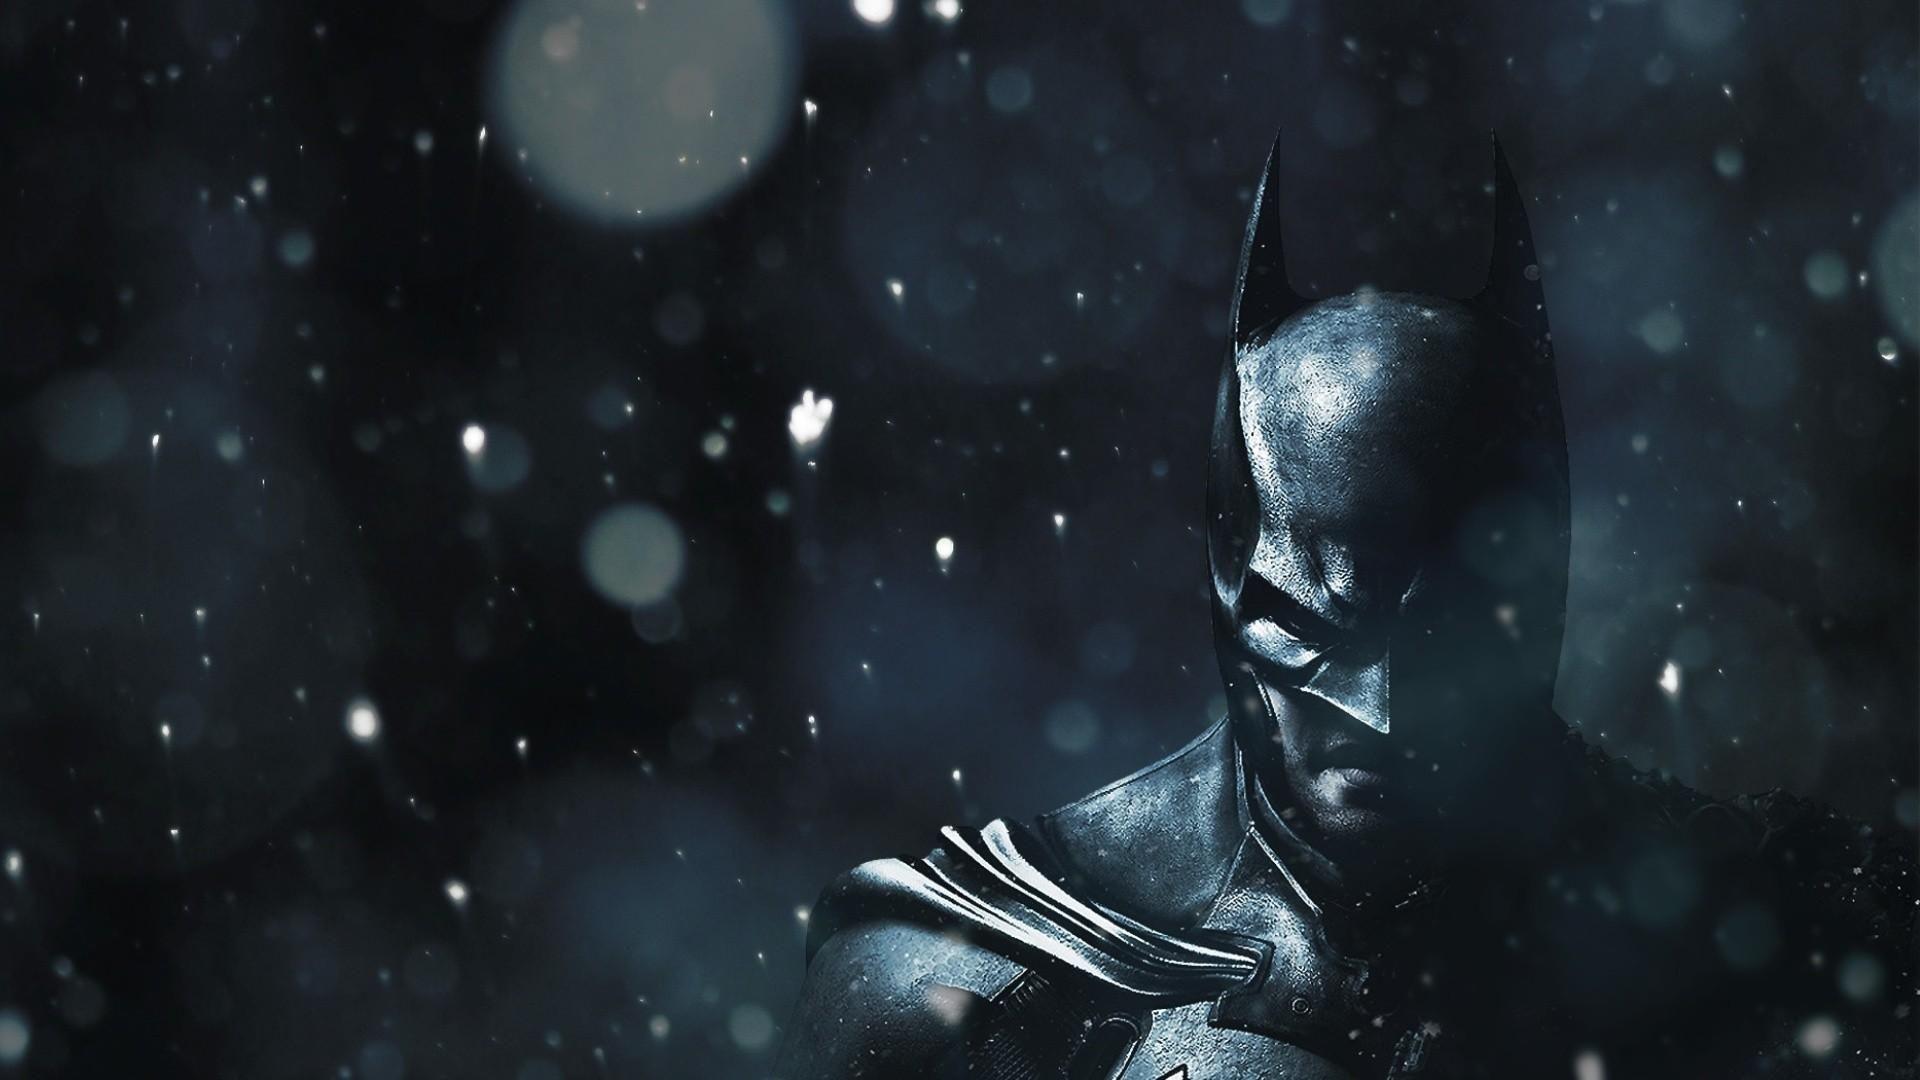 Batman Wallpapers Full HD Group (90+)